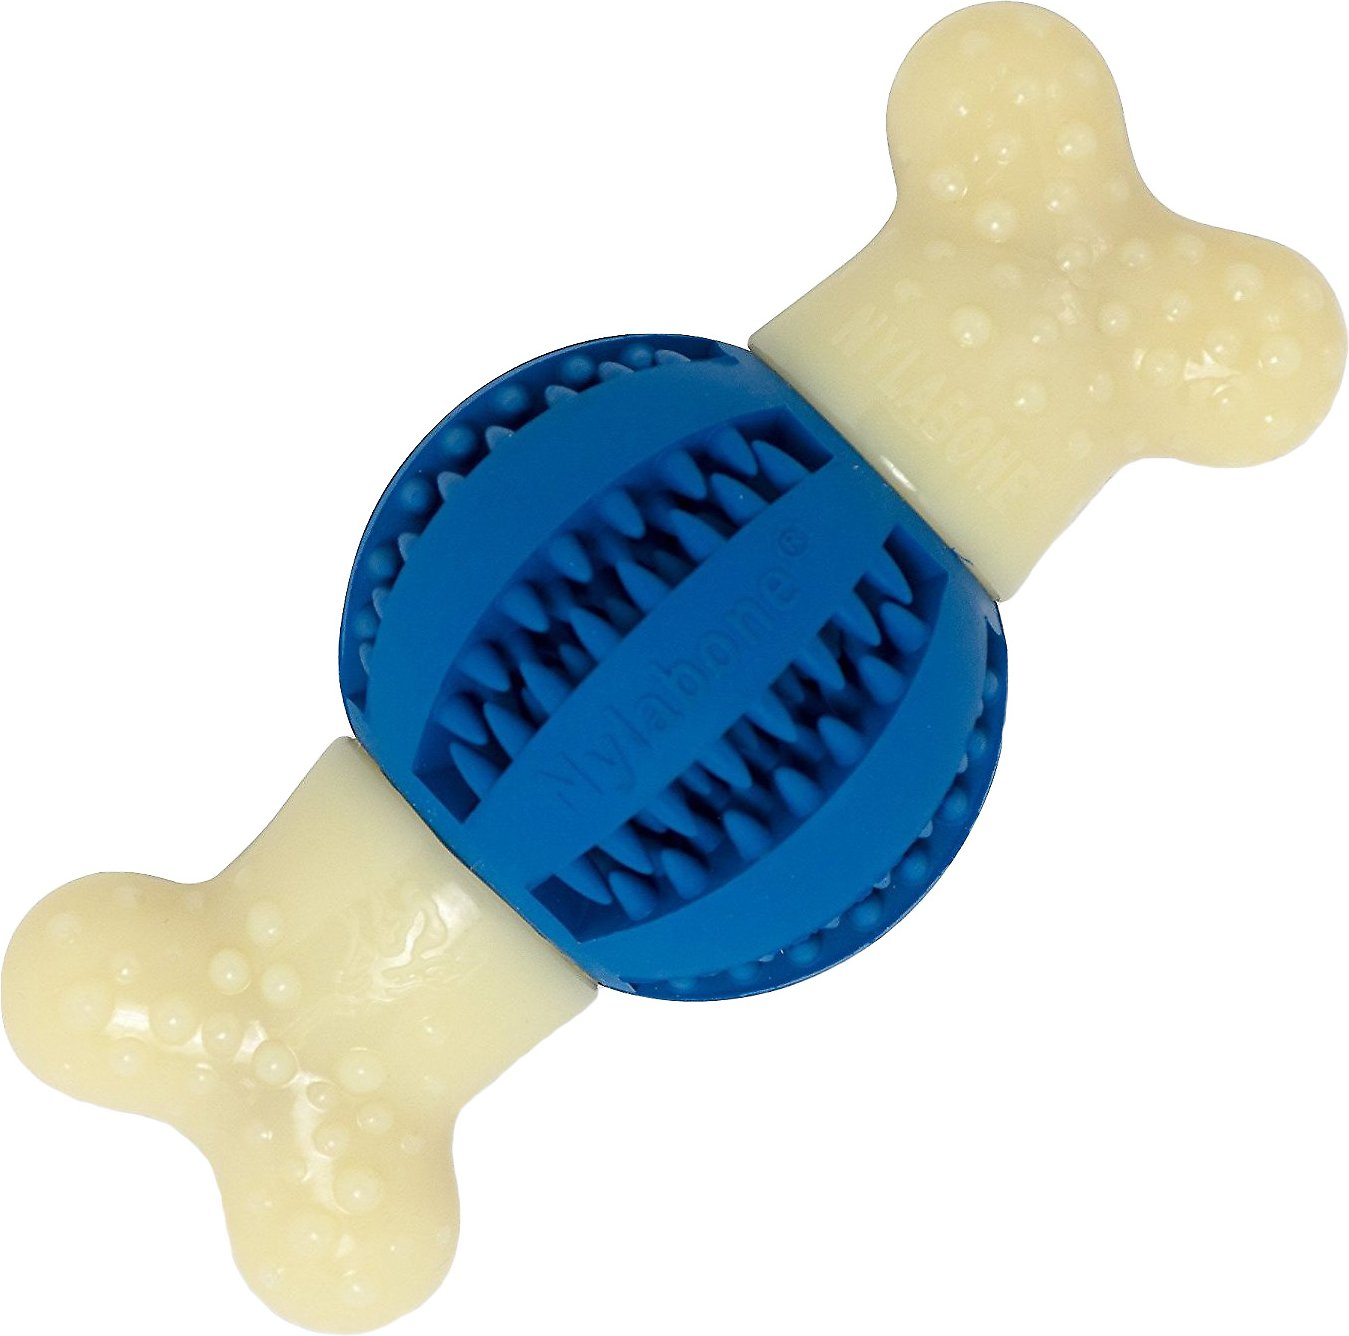 Nylabone DuraChew Double Action Round Ball Bacon Flavor Dog Toy